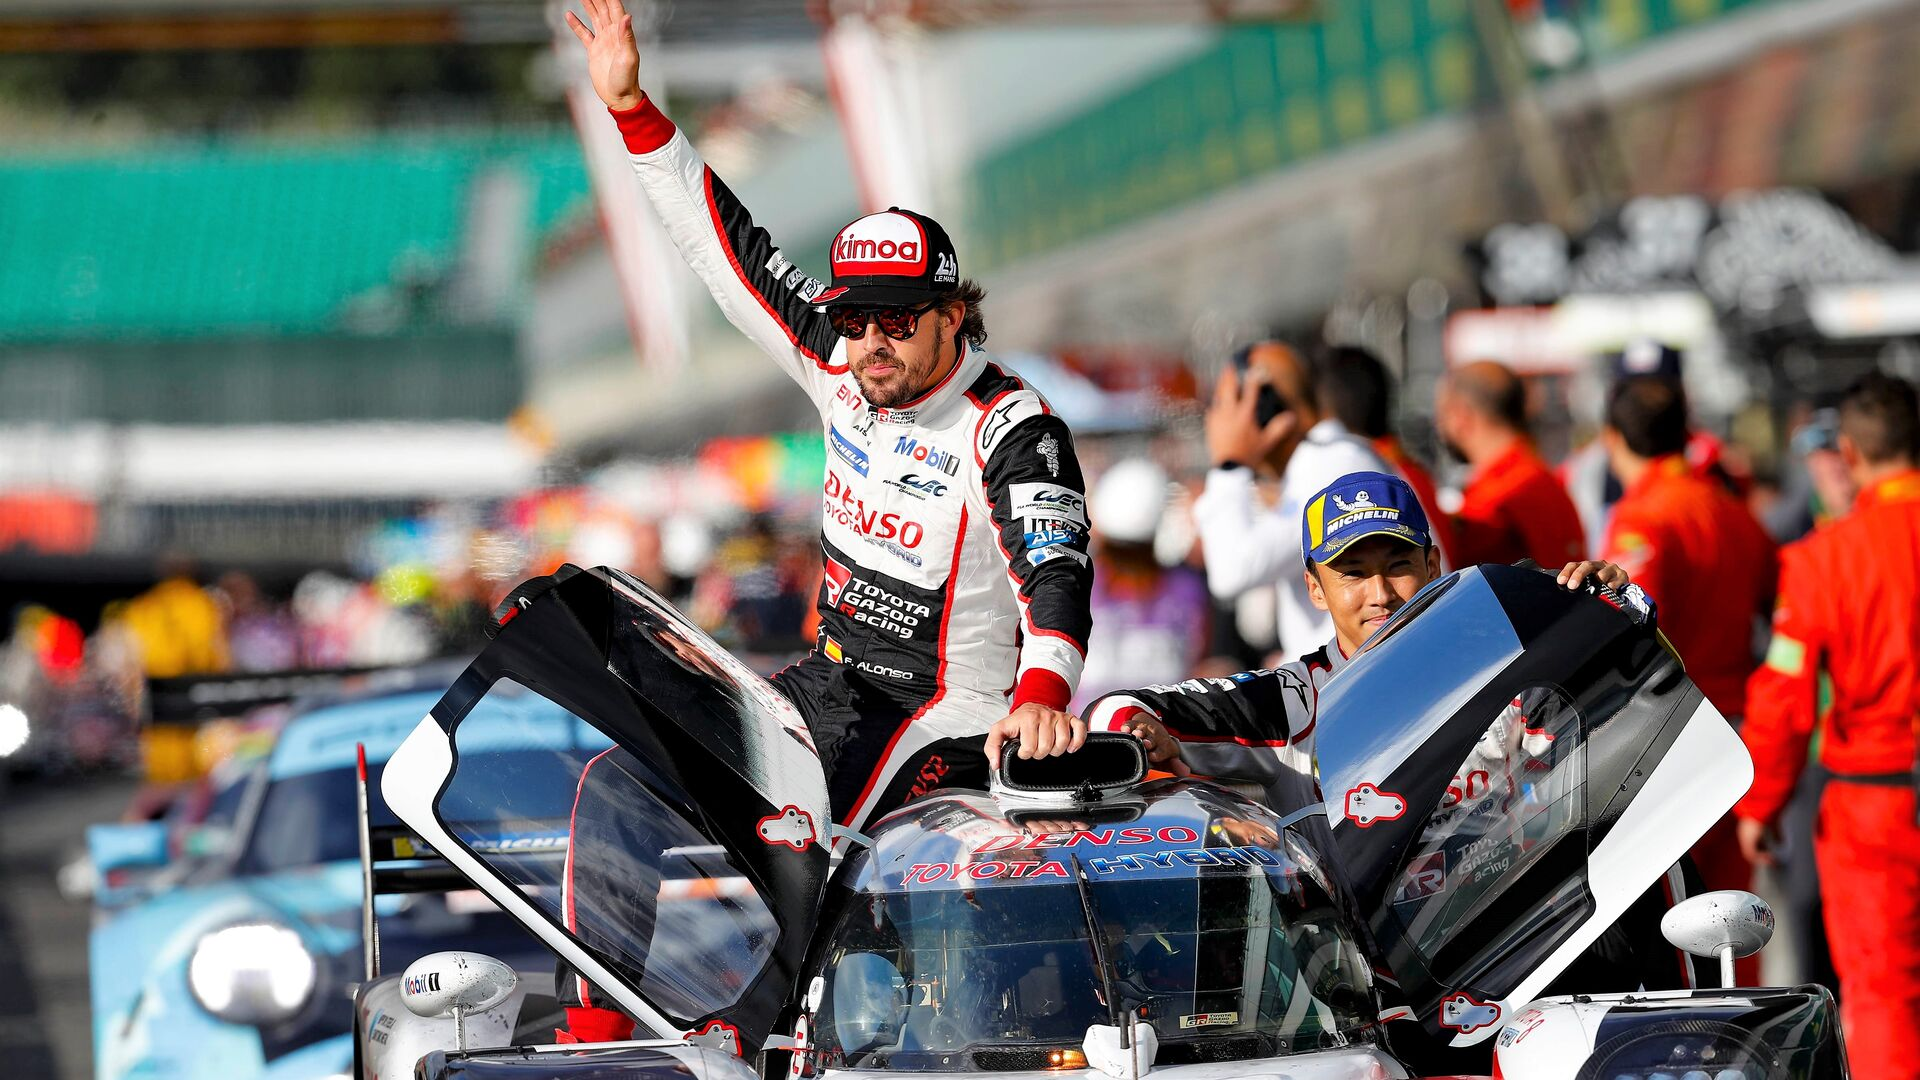 Fernando Alonso Gana Las 6 Horas De Silverstone Libertad